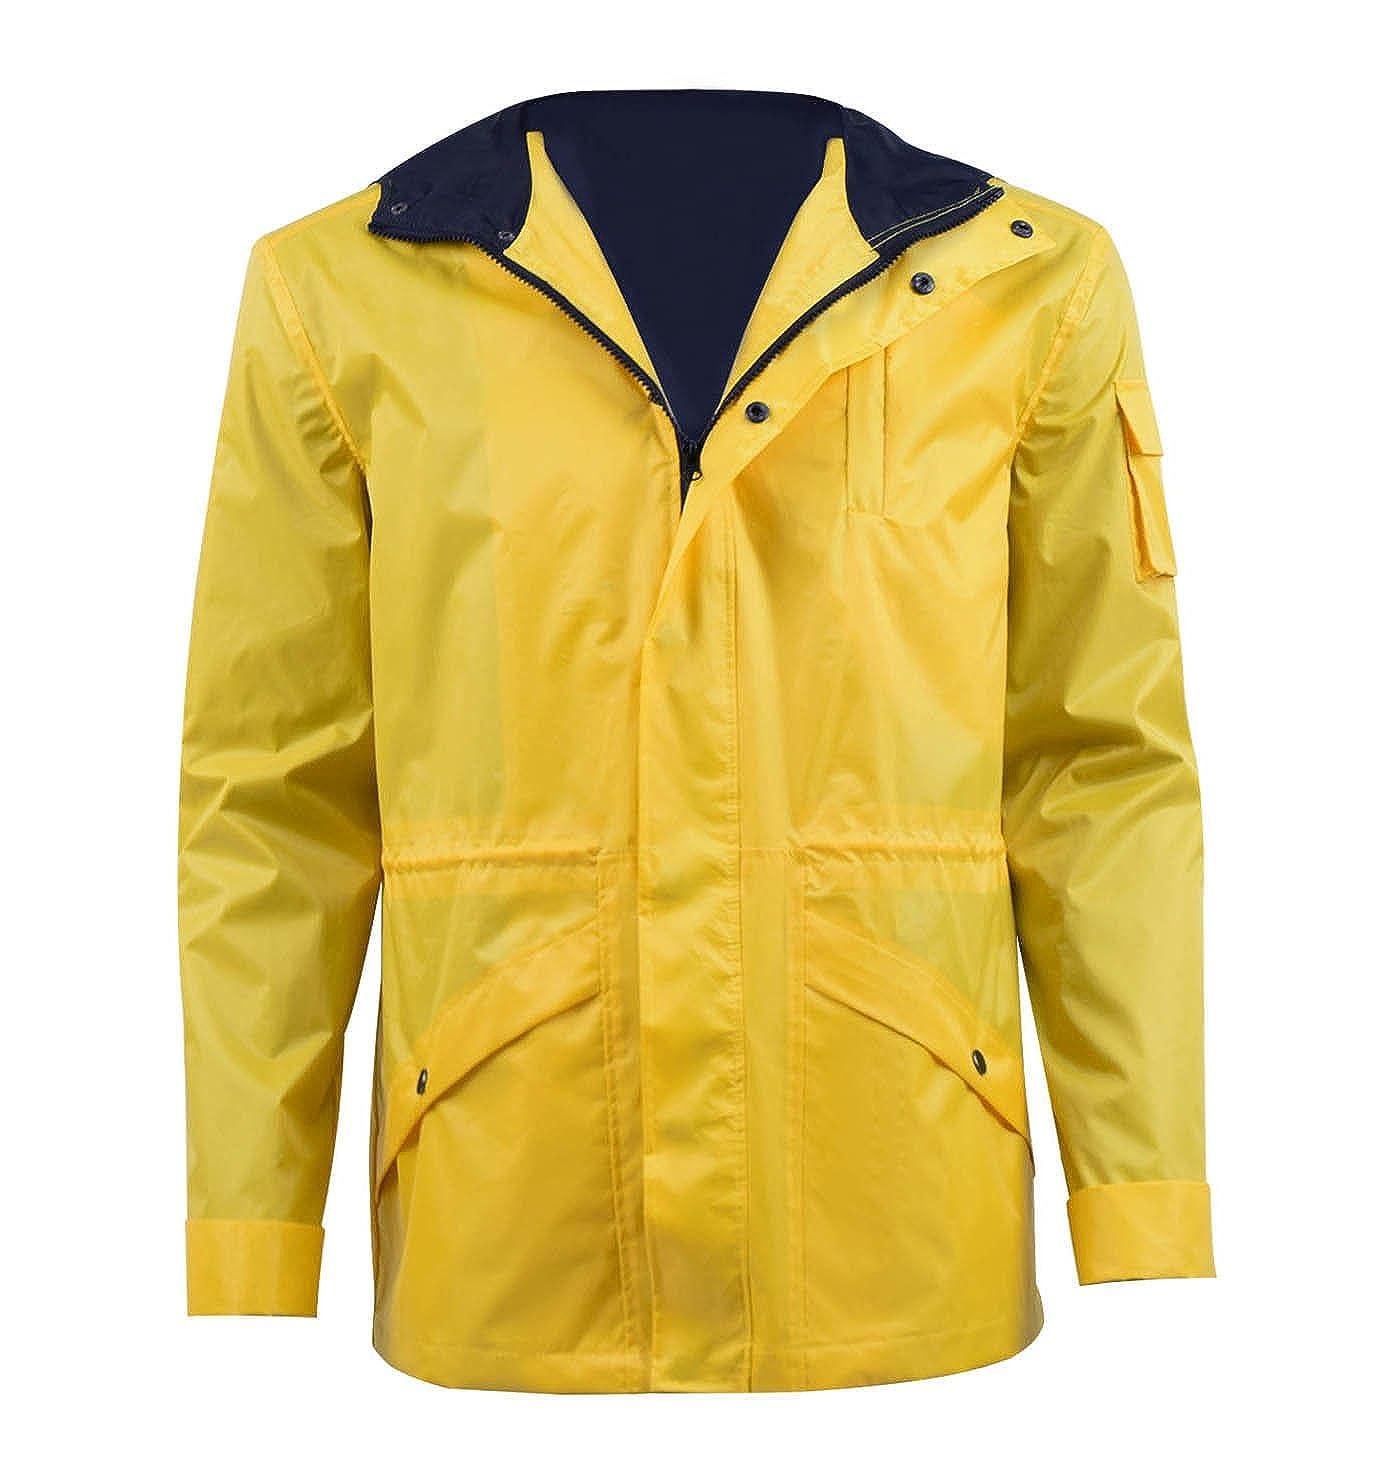 Unbekannt Herren Outdoor Regenjacke Regenmantel Jacke Wasserdicht Gelb